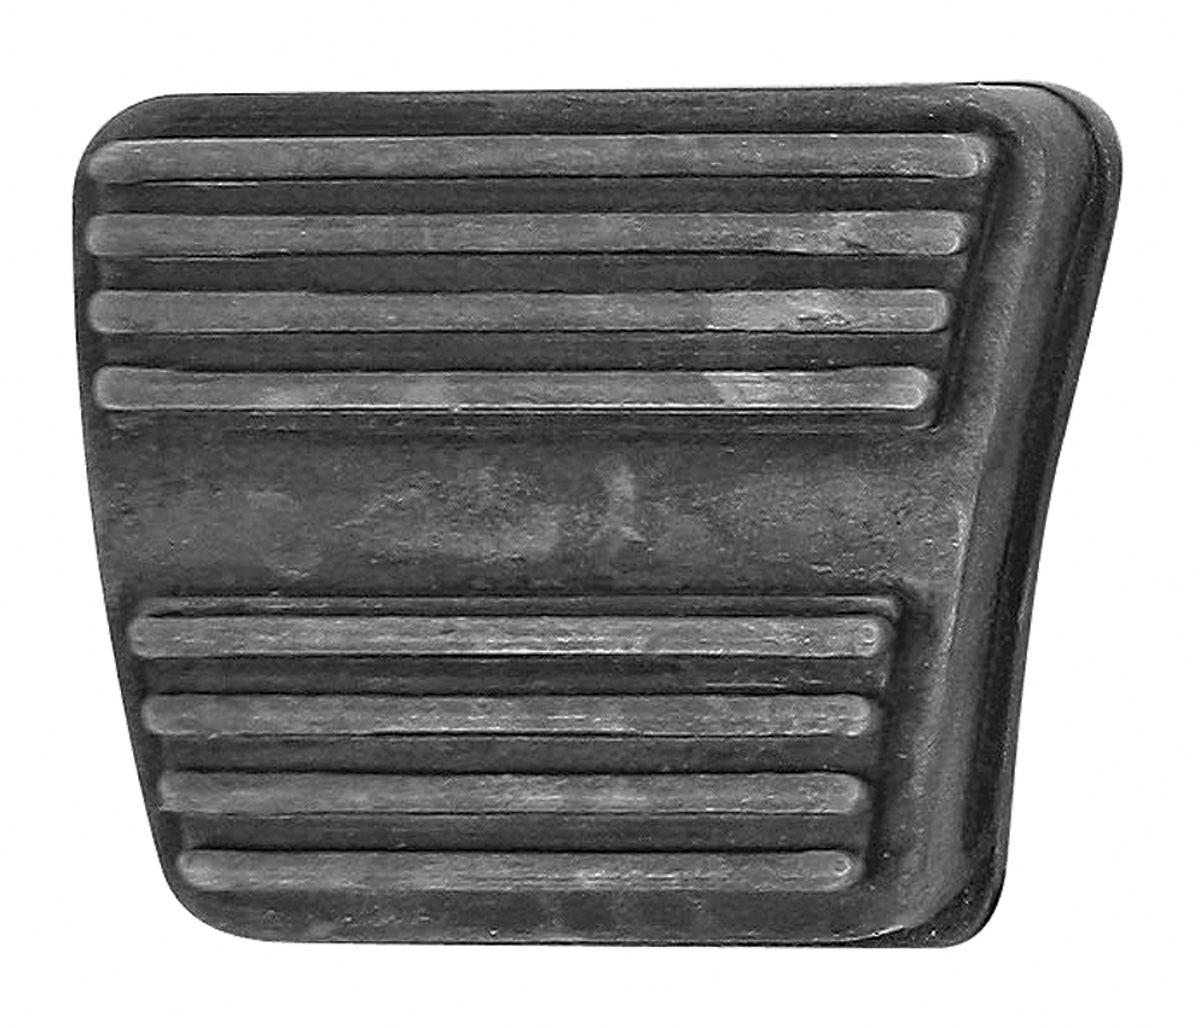 Pad, Pedal, 1978-88 El Camino/Monte Carlo/1978-83 Malibu, Parking Brake